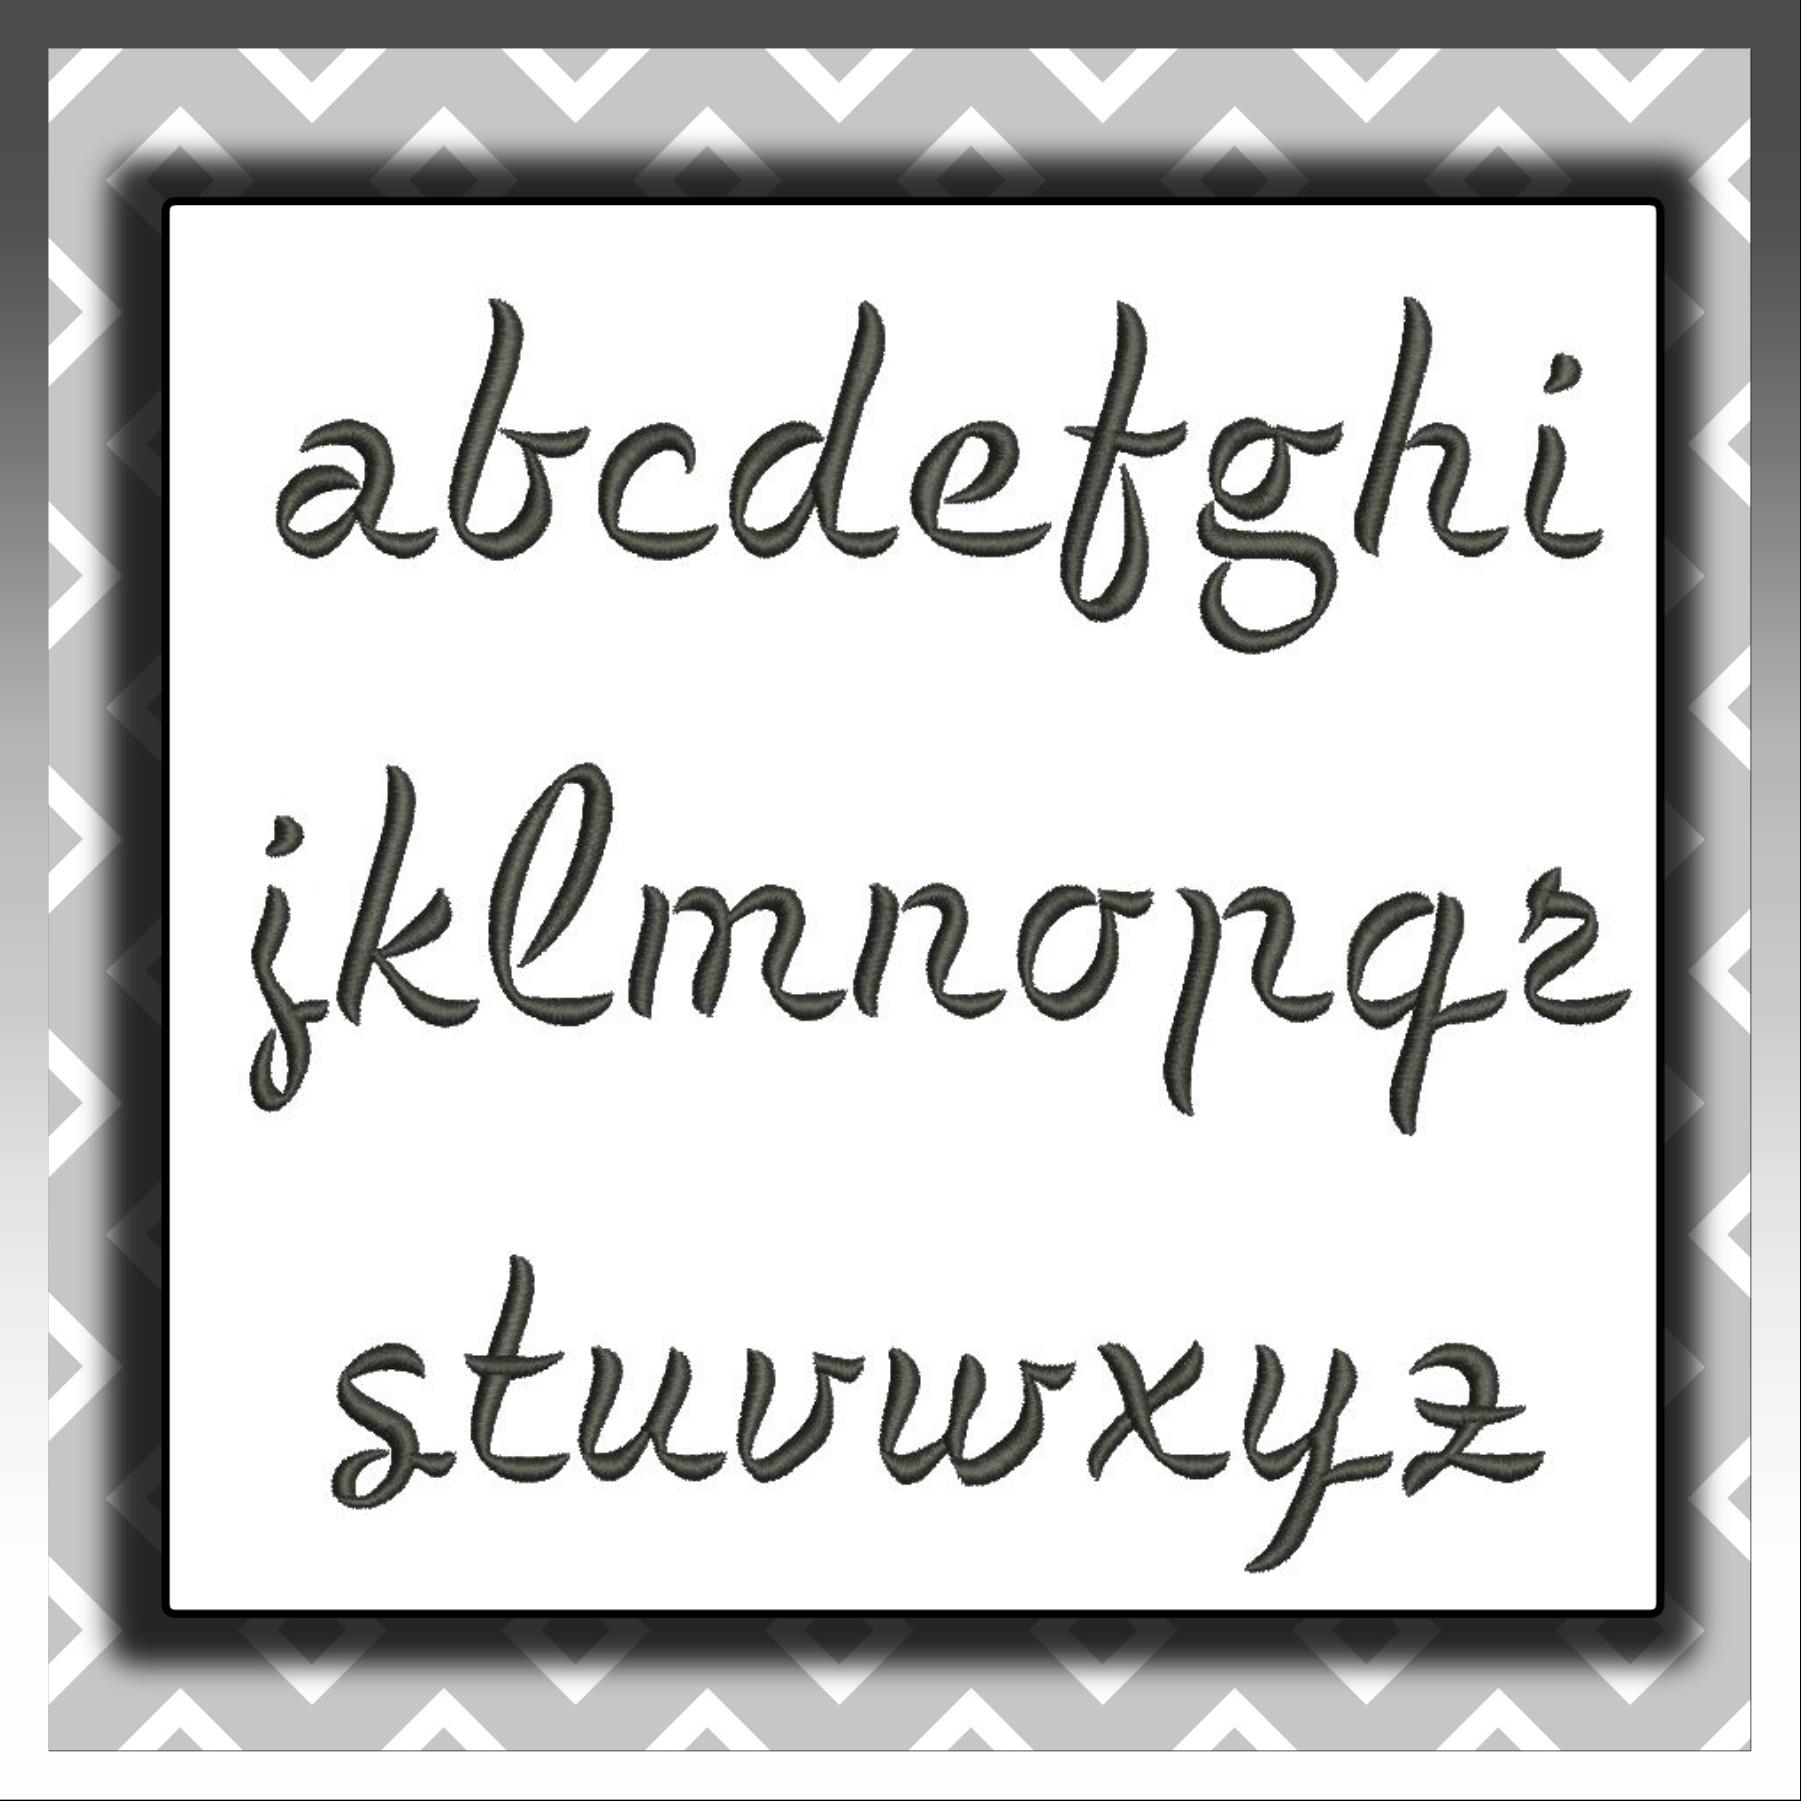 Black Mod Font sm a-z